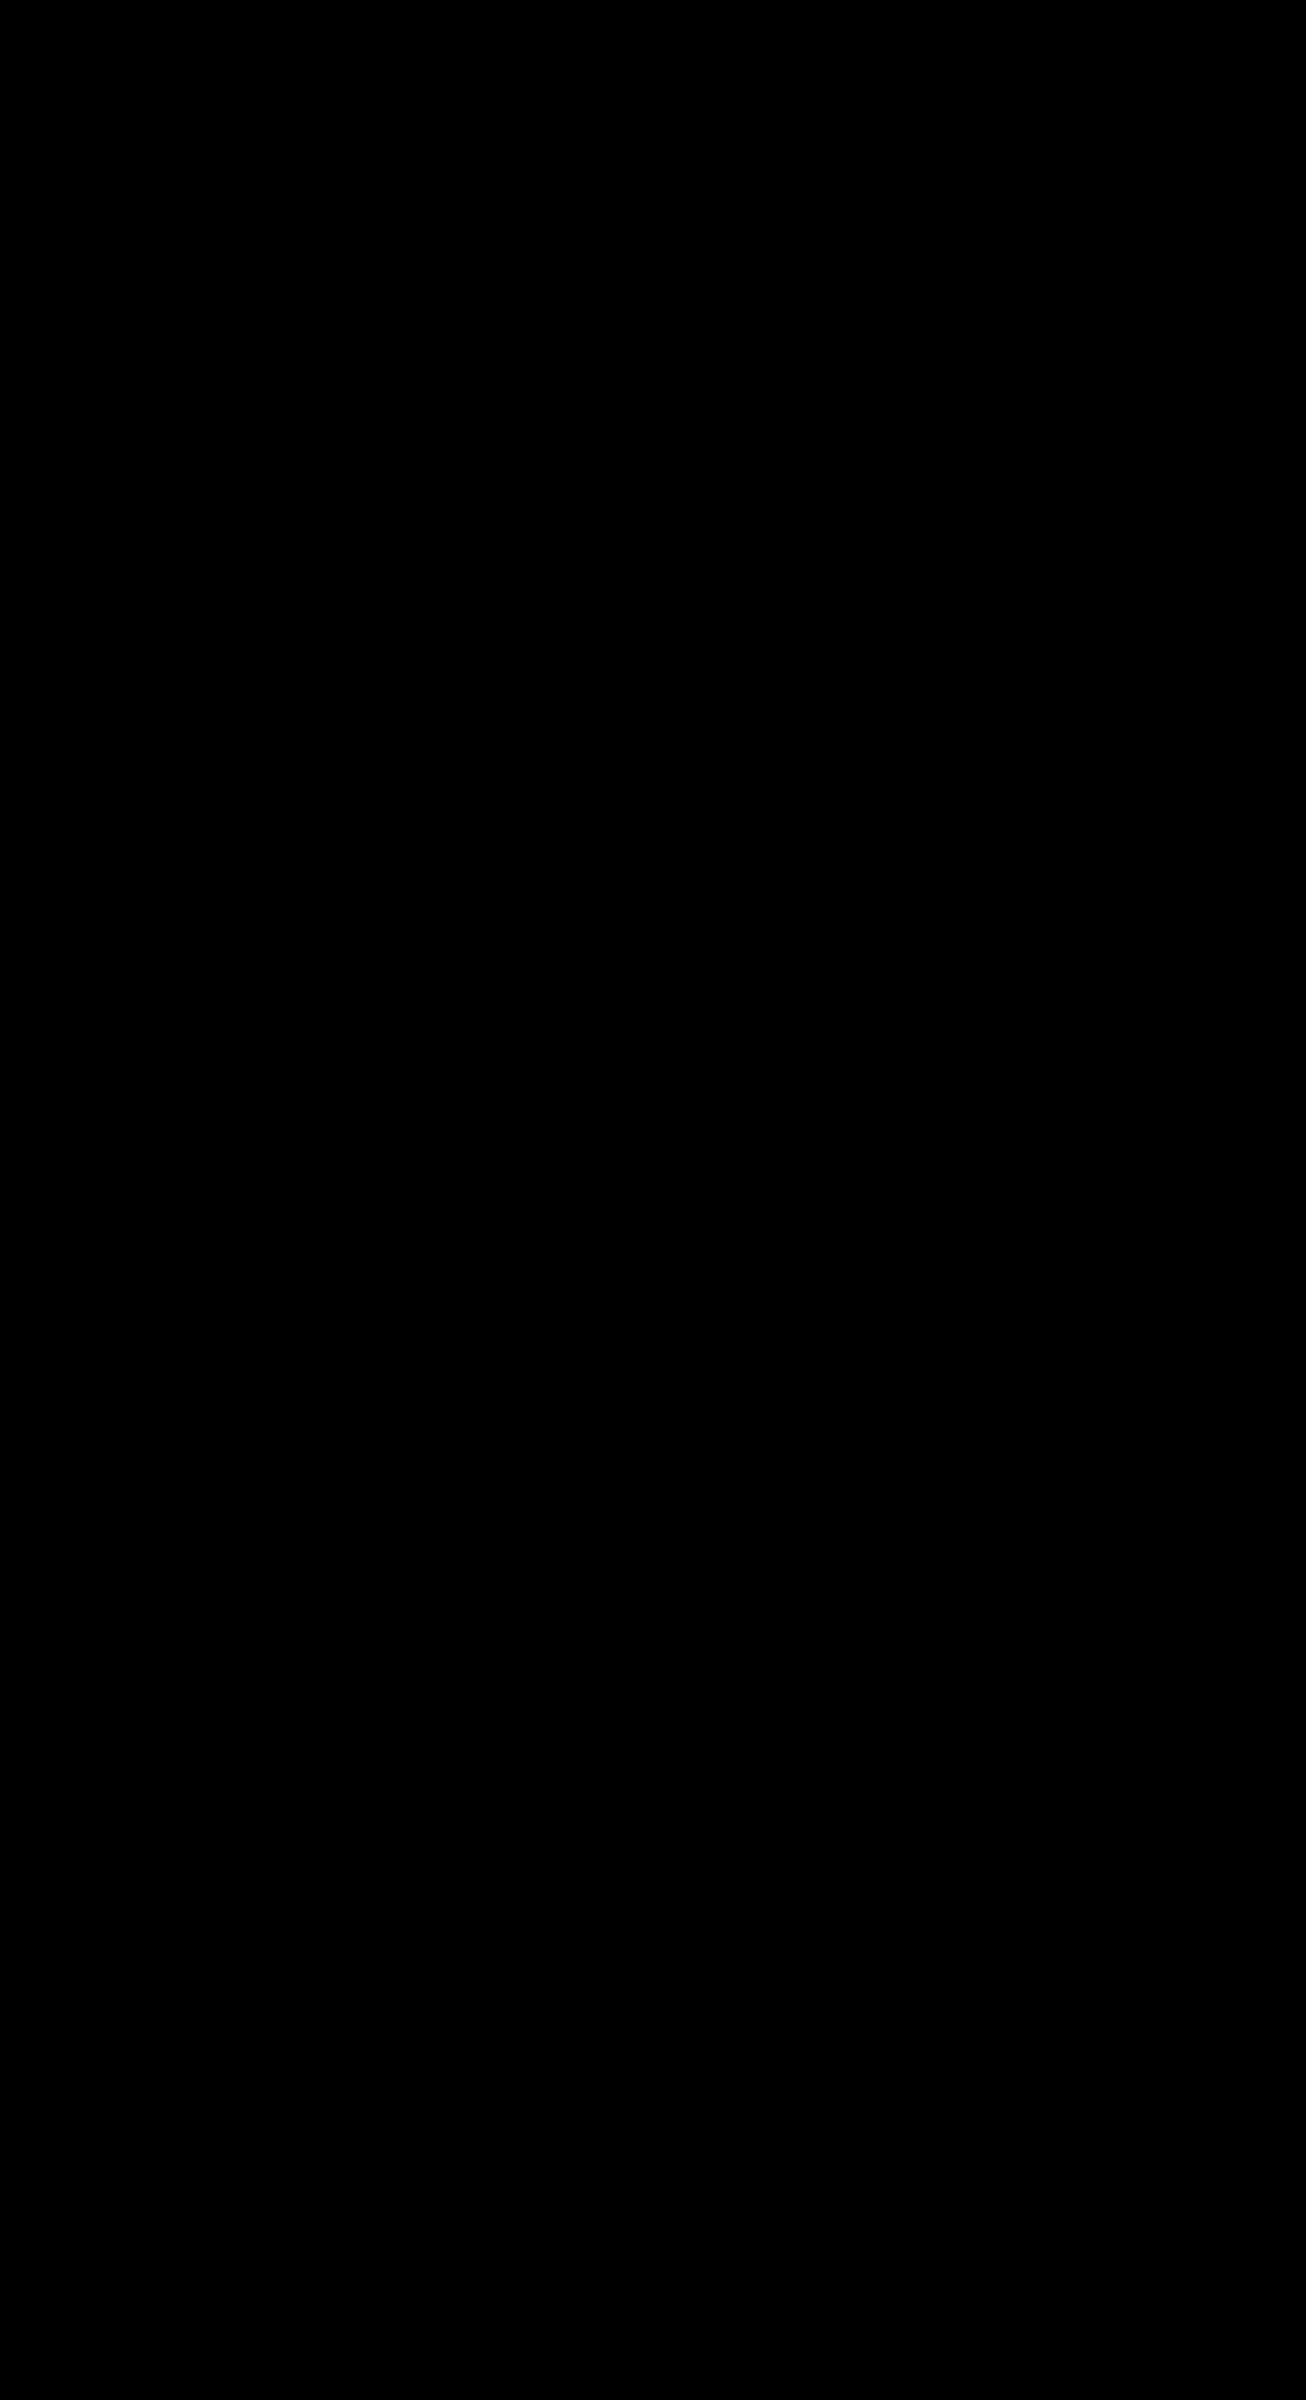 Greek clipart drawing. Urn at getdrawings com